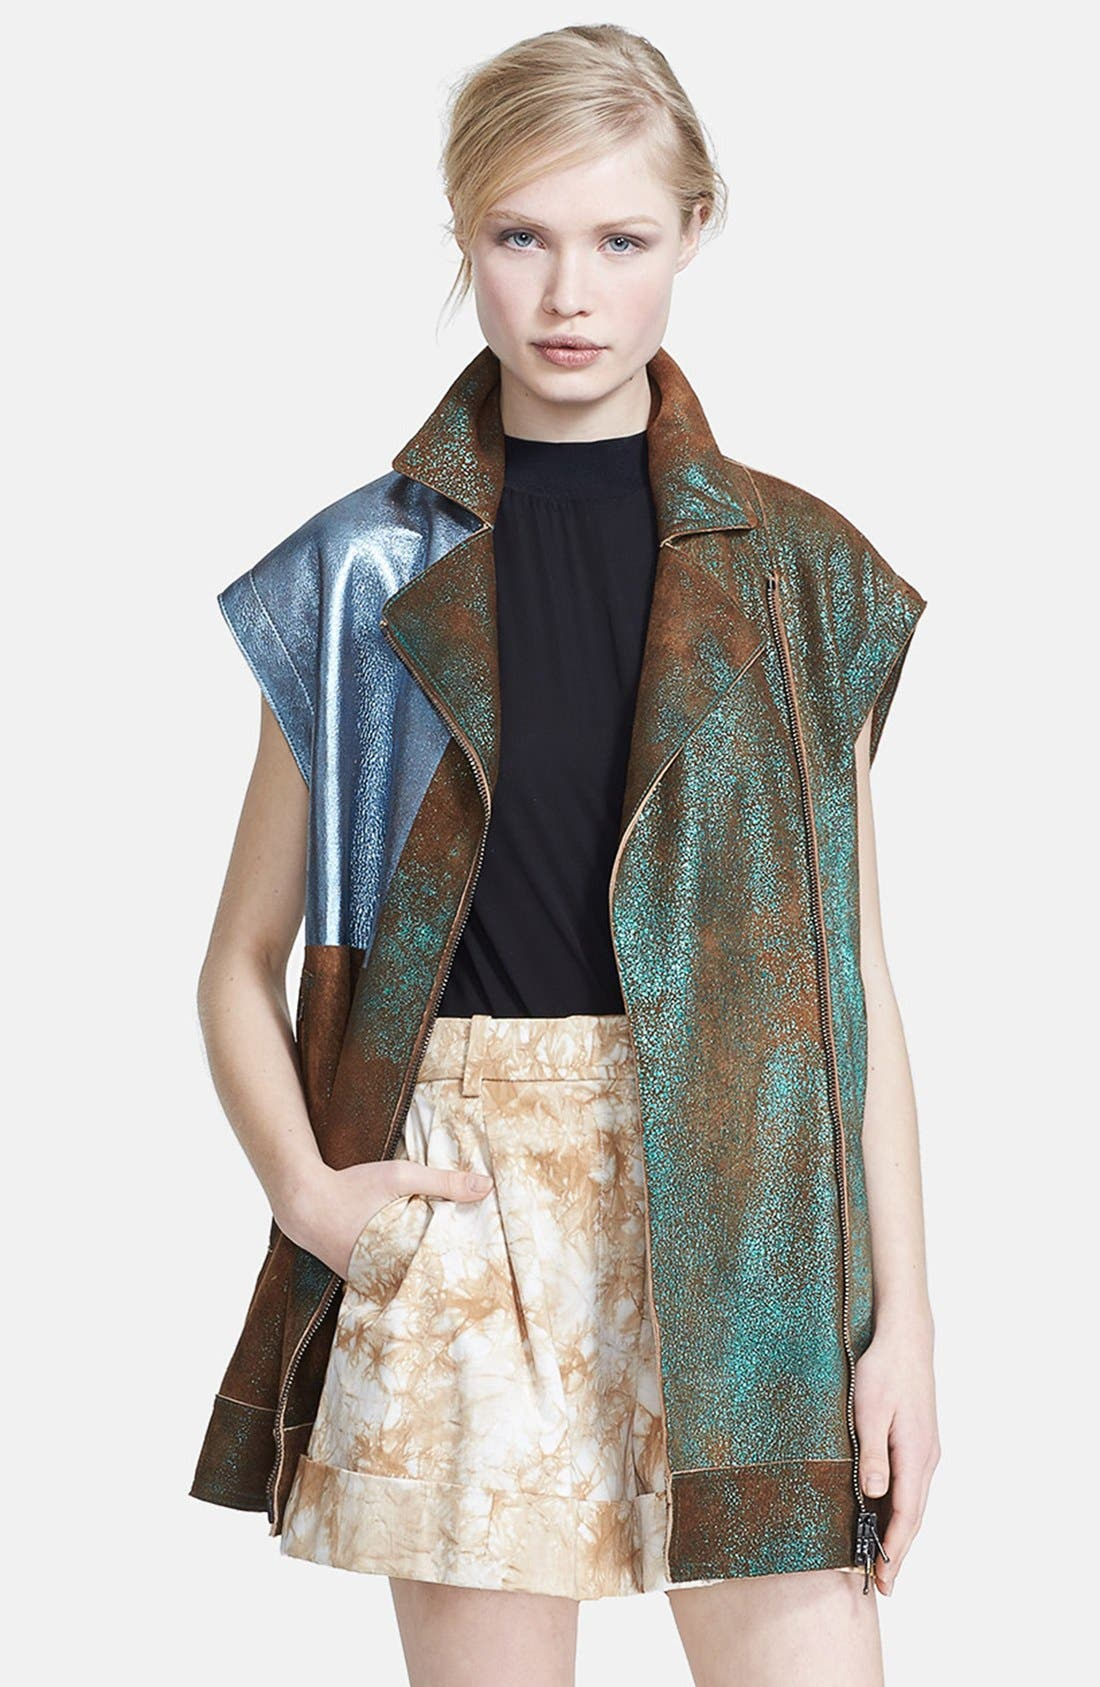 Alternate Image 1 Selected - 3.1 Phillip Lim Foiled Moto Leather Vest